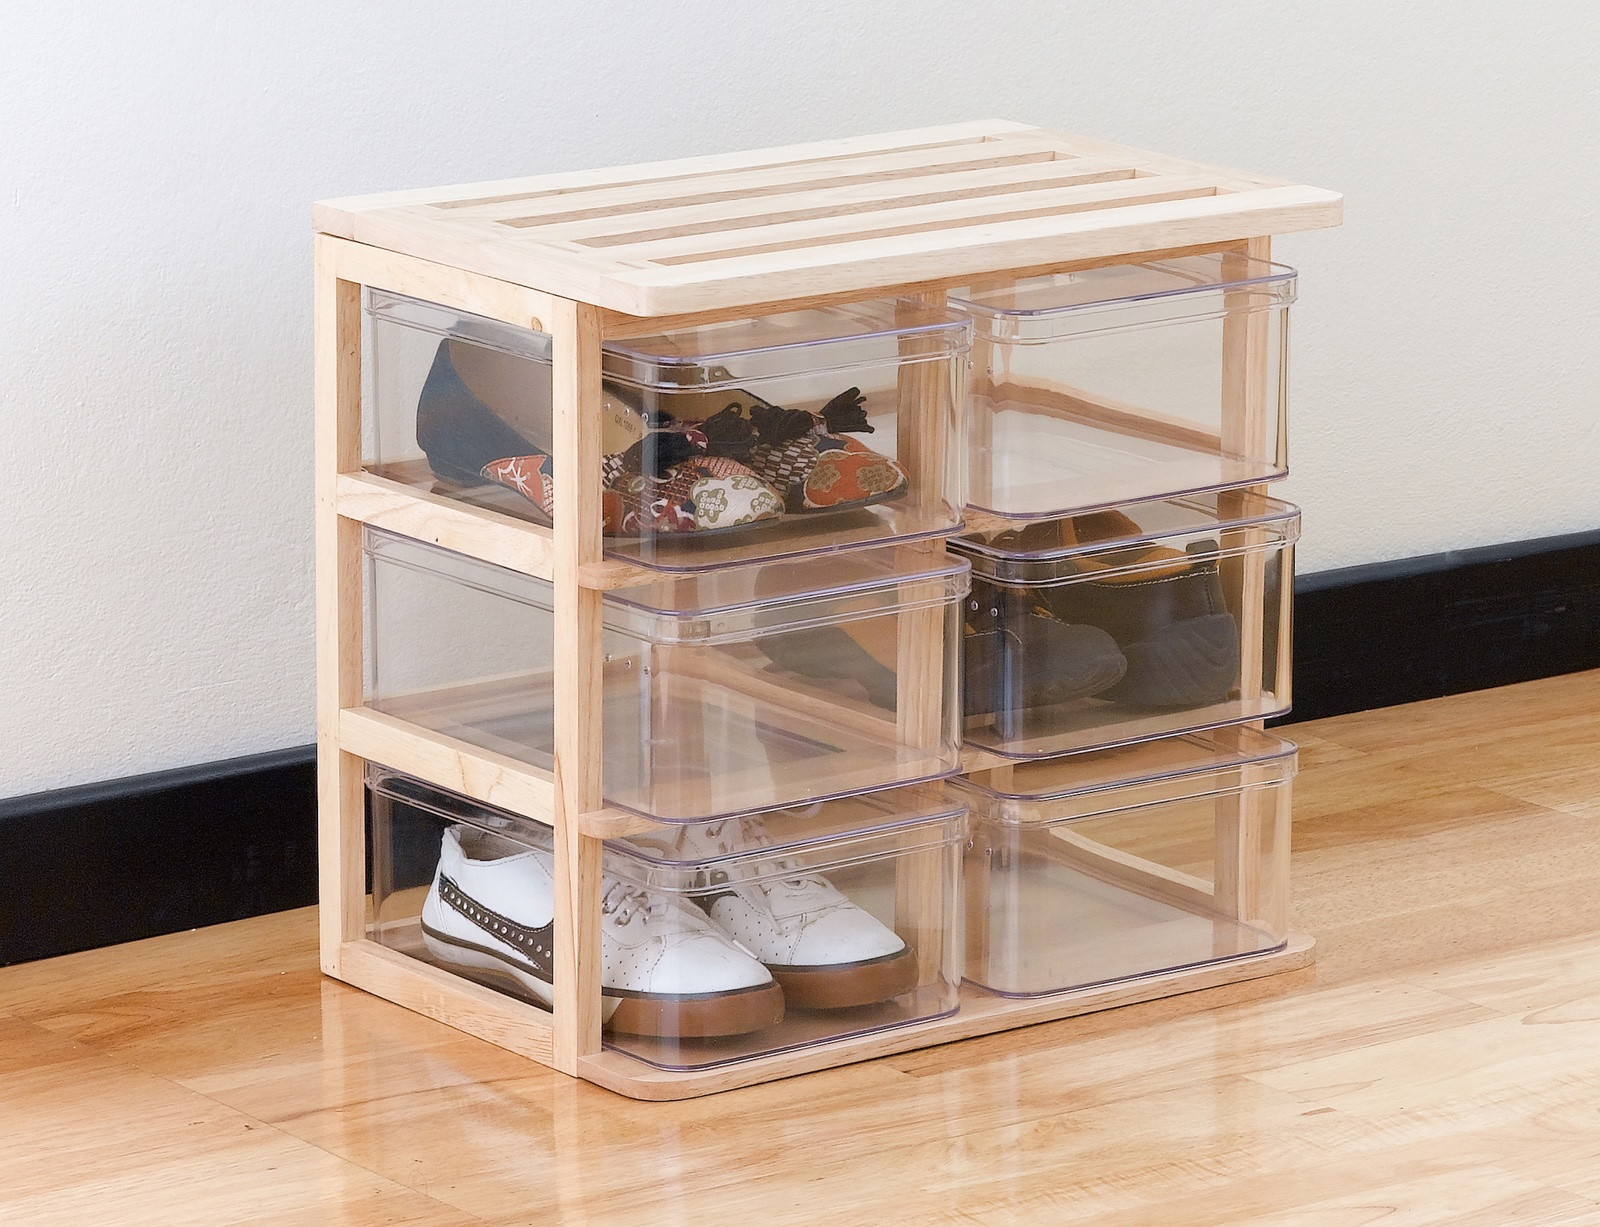 Ideas para organizar zapatos en cajas transparentes